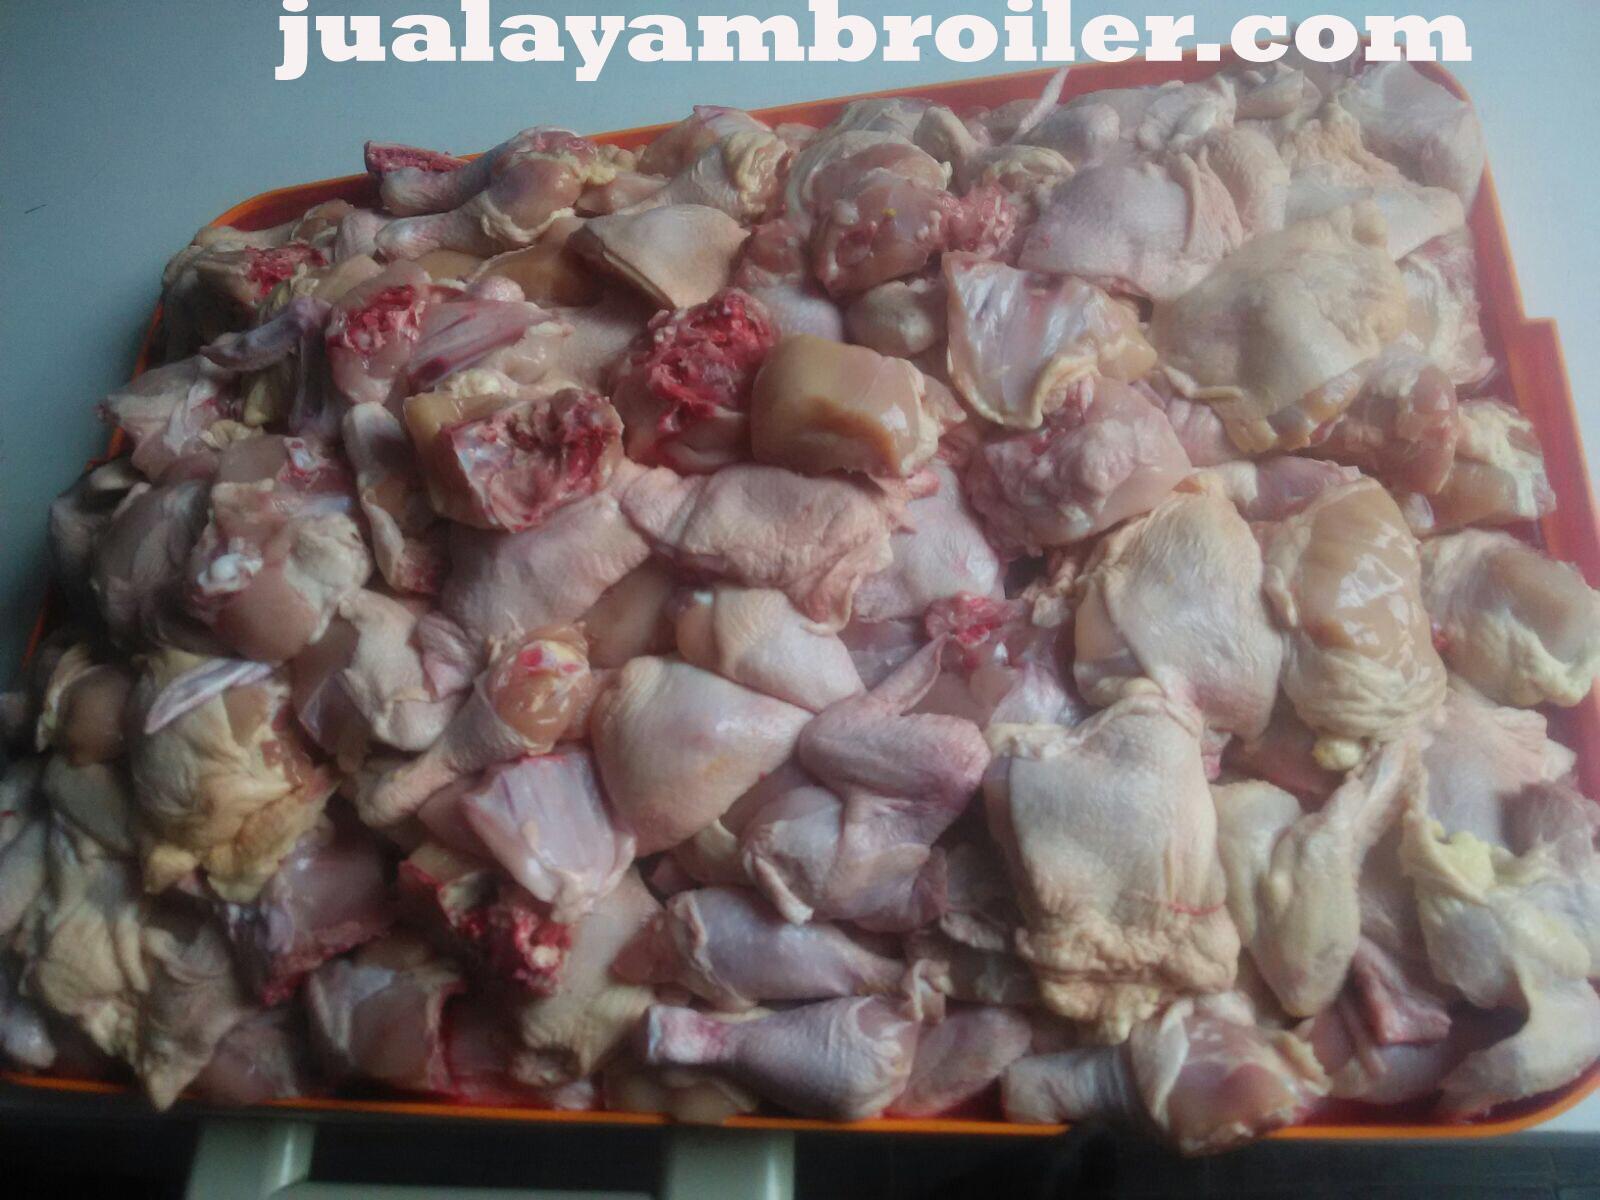 Jual Ayam Karkas Dewi Sartika Jakarta Timur